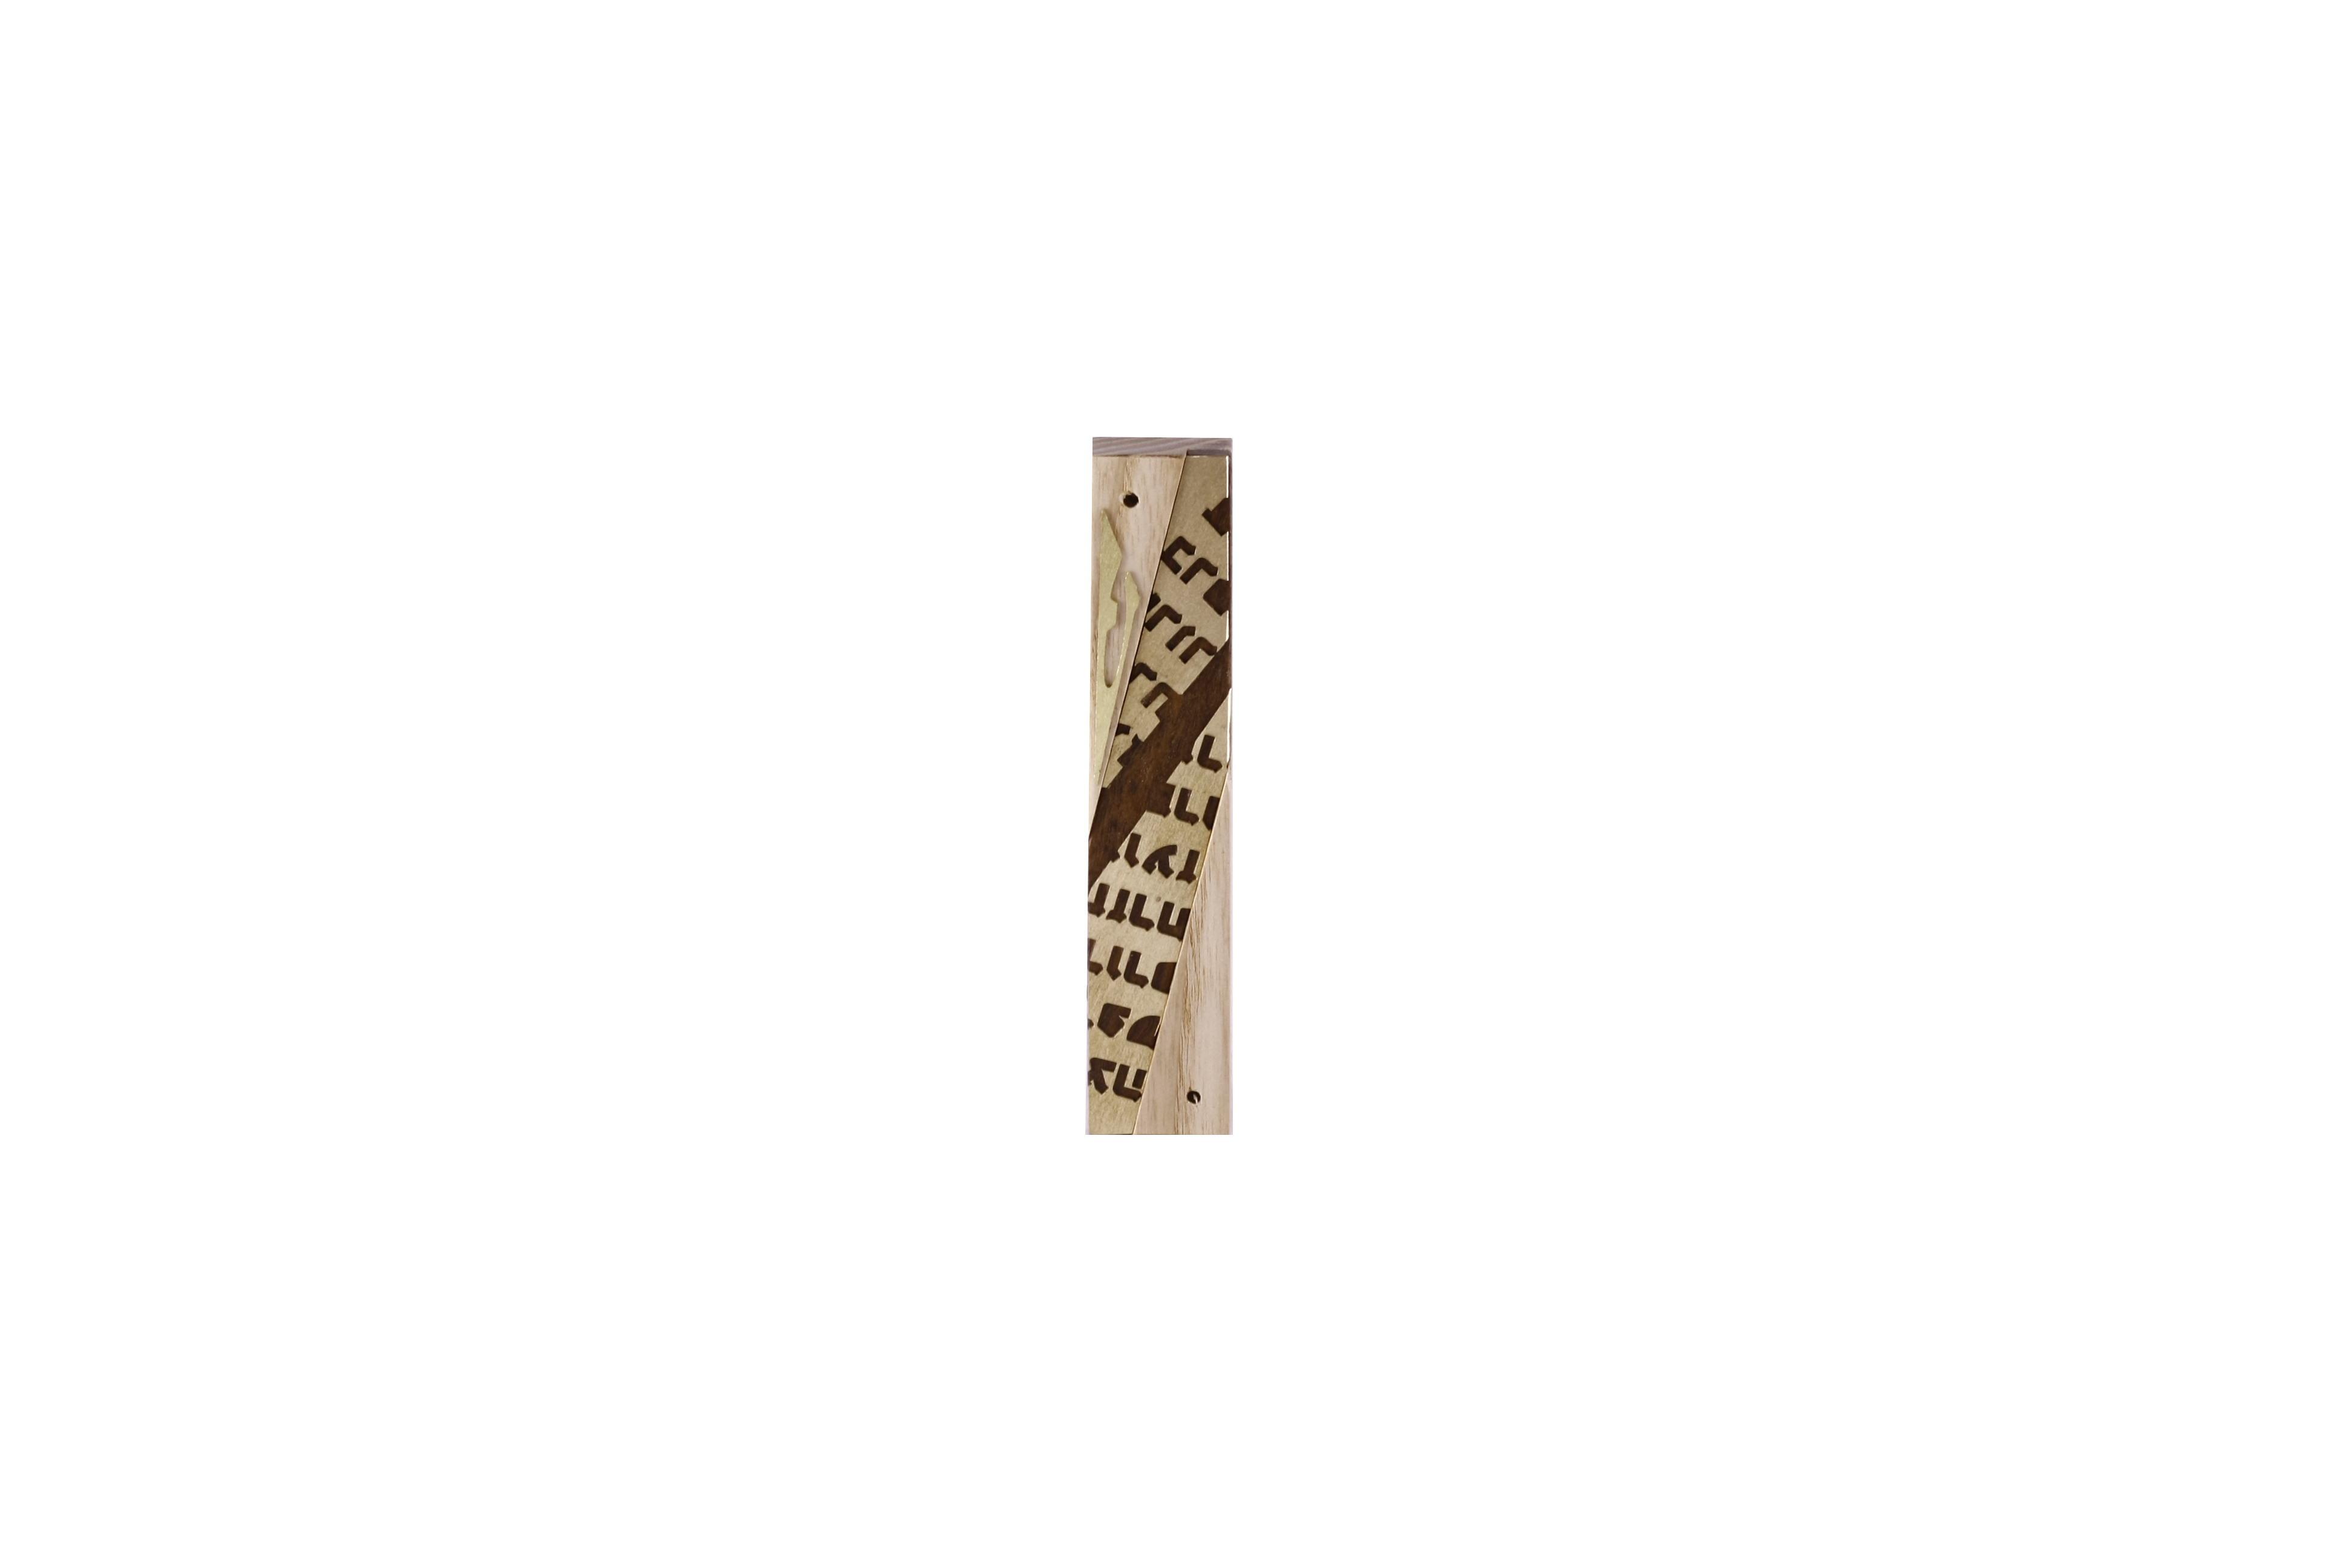 #1 - Modern Wood Mezuzah - Designer Metal & Wood Mezuzah Case - Housewarming Gift - Maple/Ebony/Brass